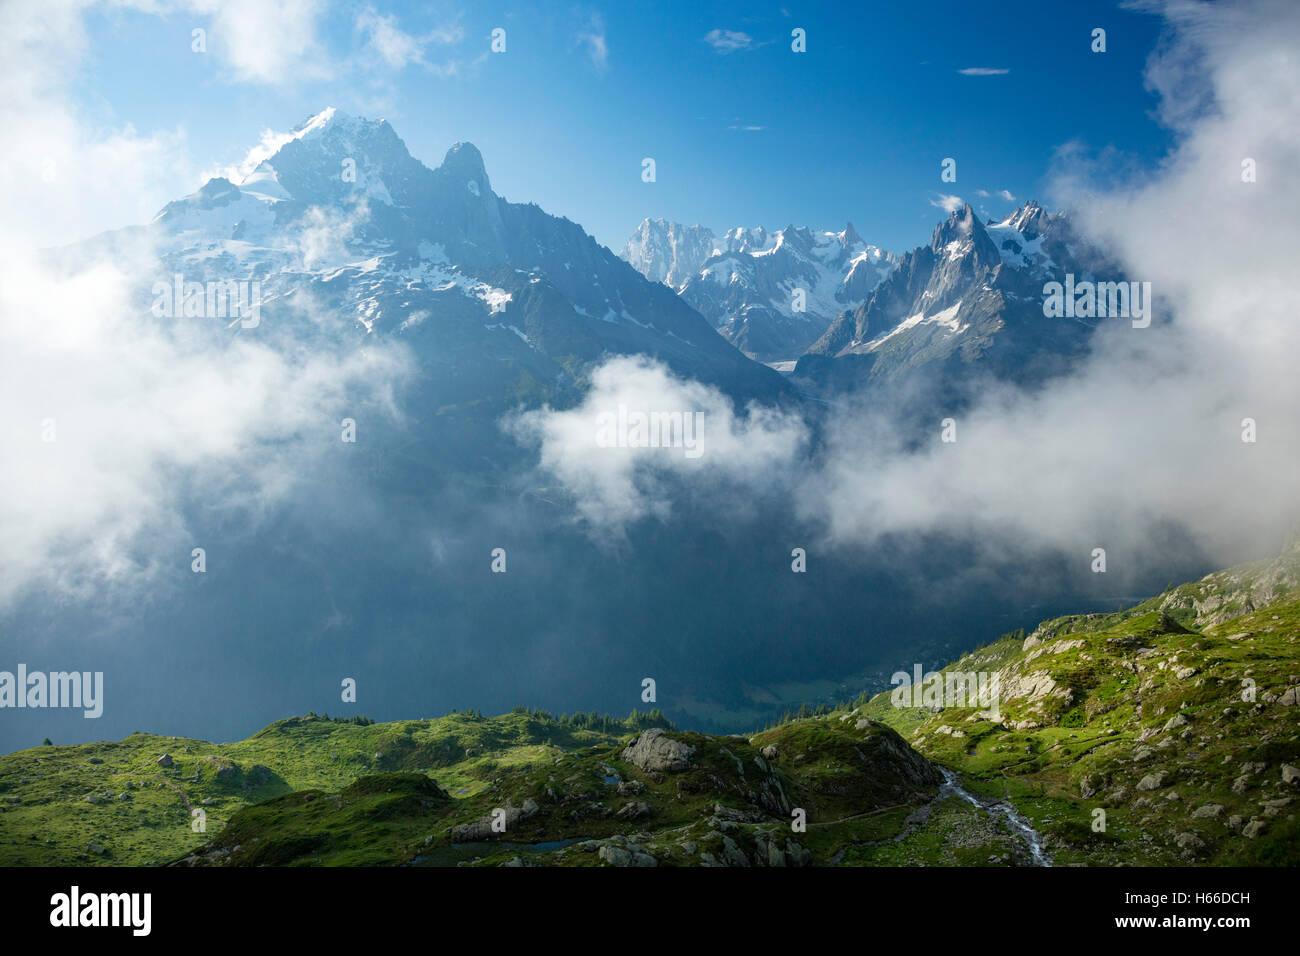 Aiguille Verte rises across the Chamonix Valley, Haute Savoie, French Alps, France. - Stock Image